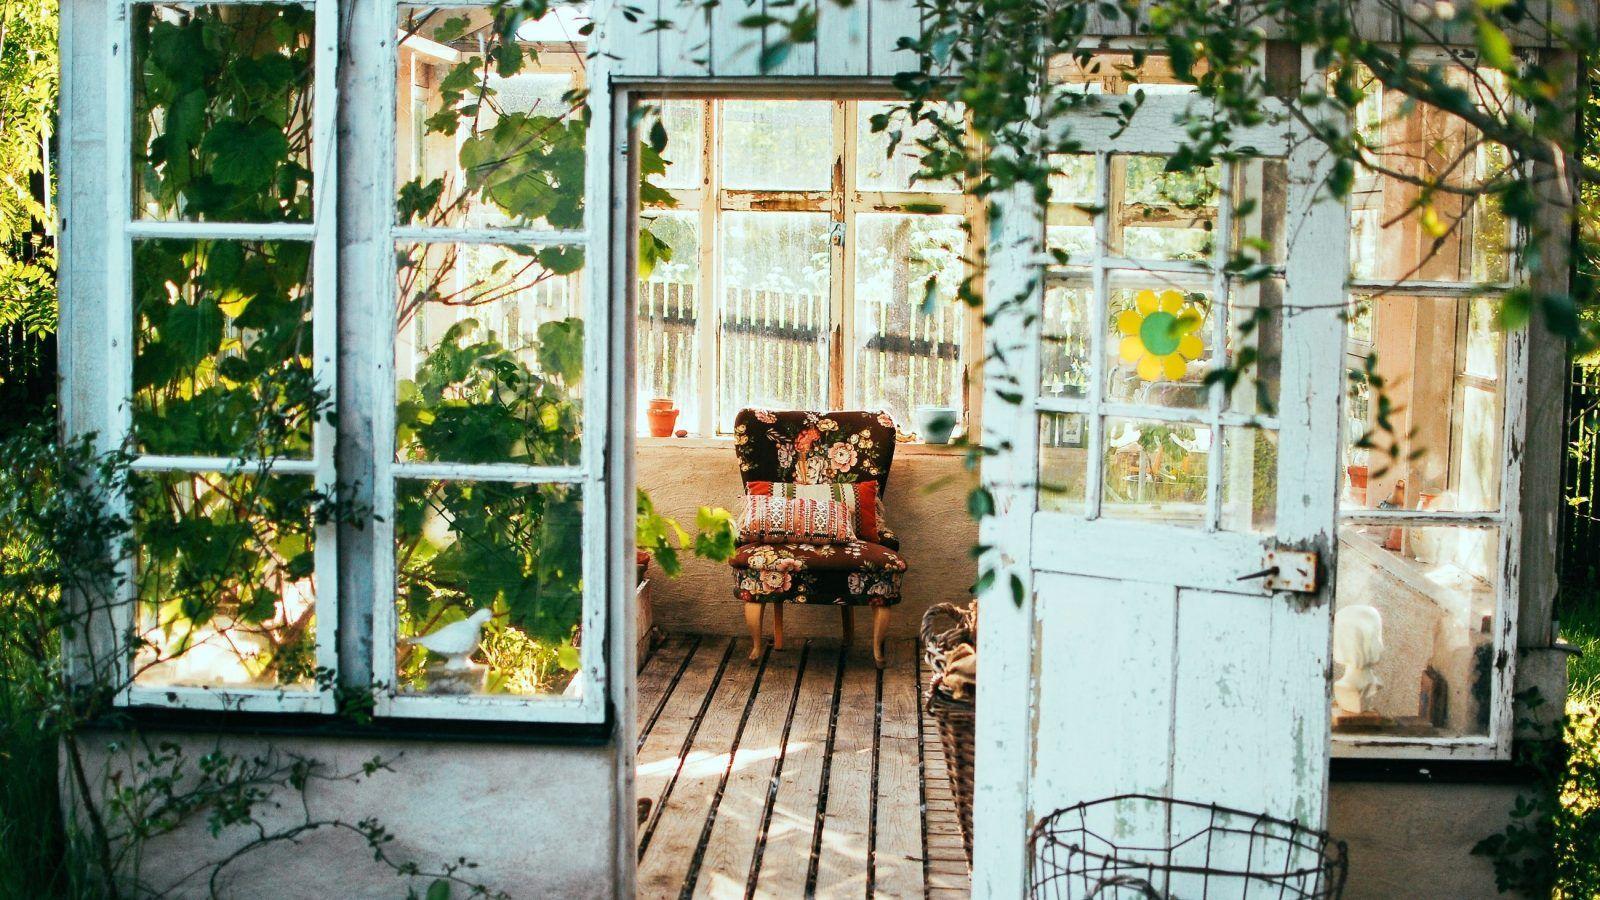 Feng Shui voor tuin en balkon: hoe pak je dat aan? - Holistik